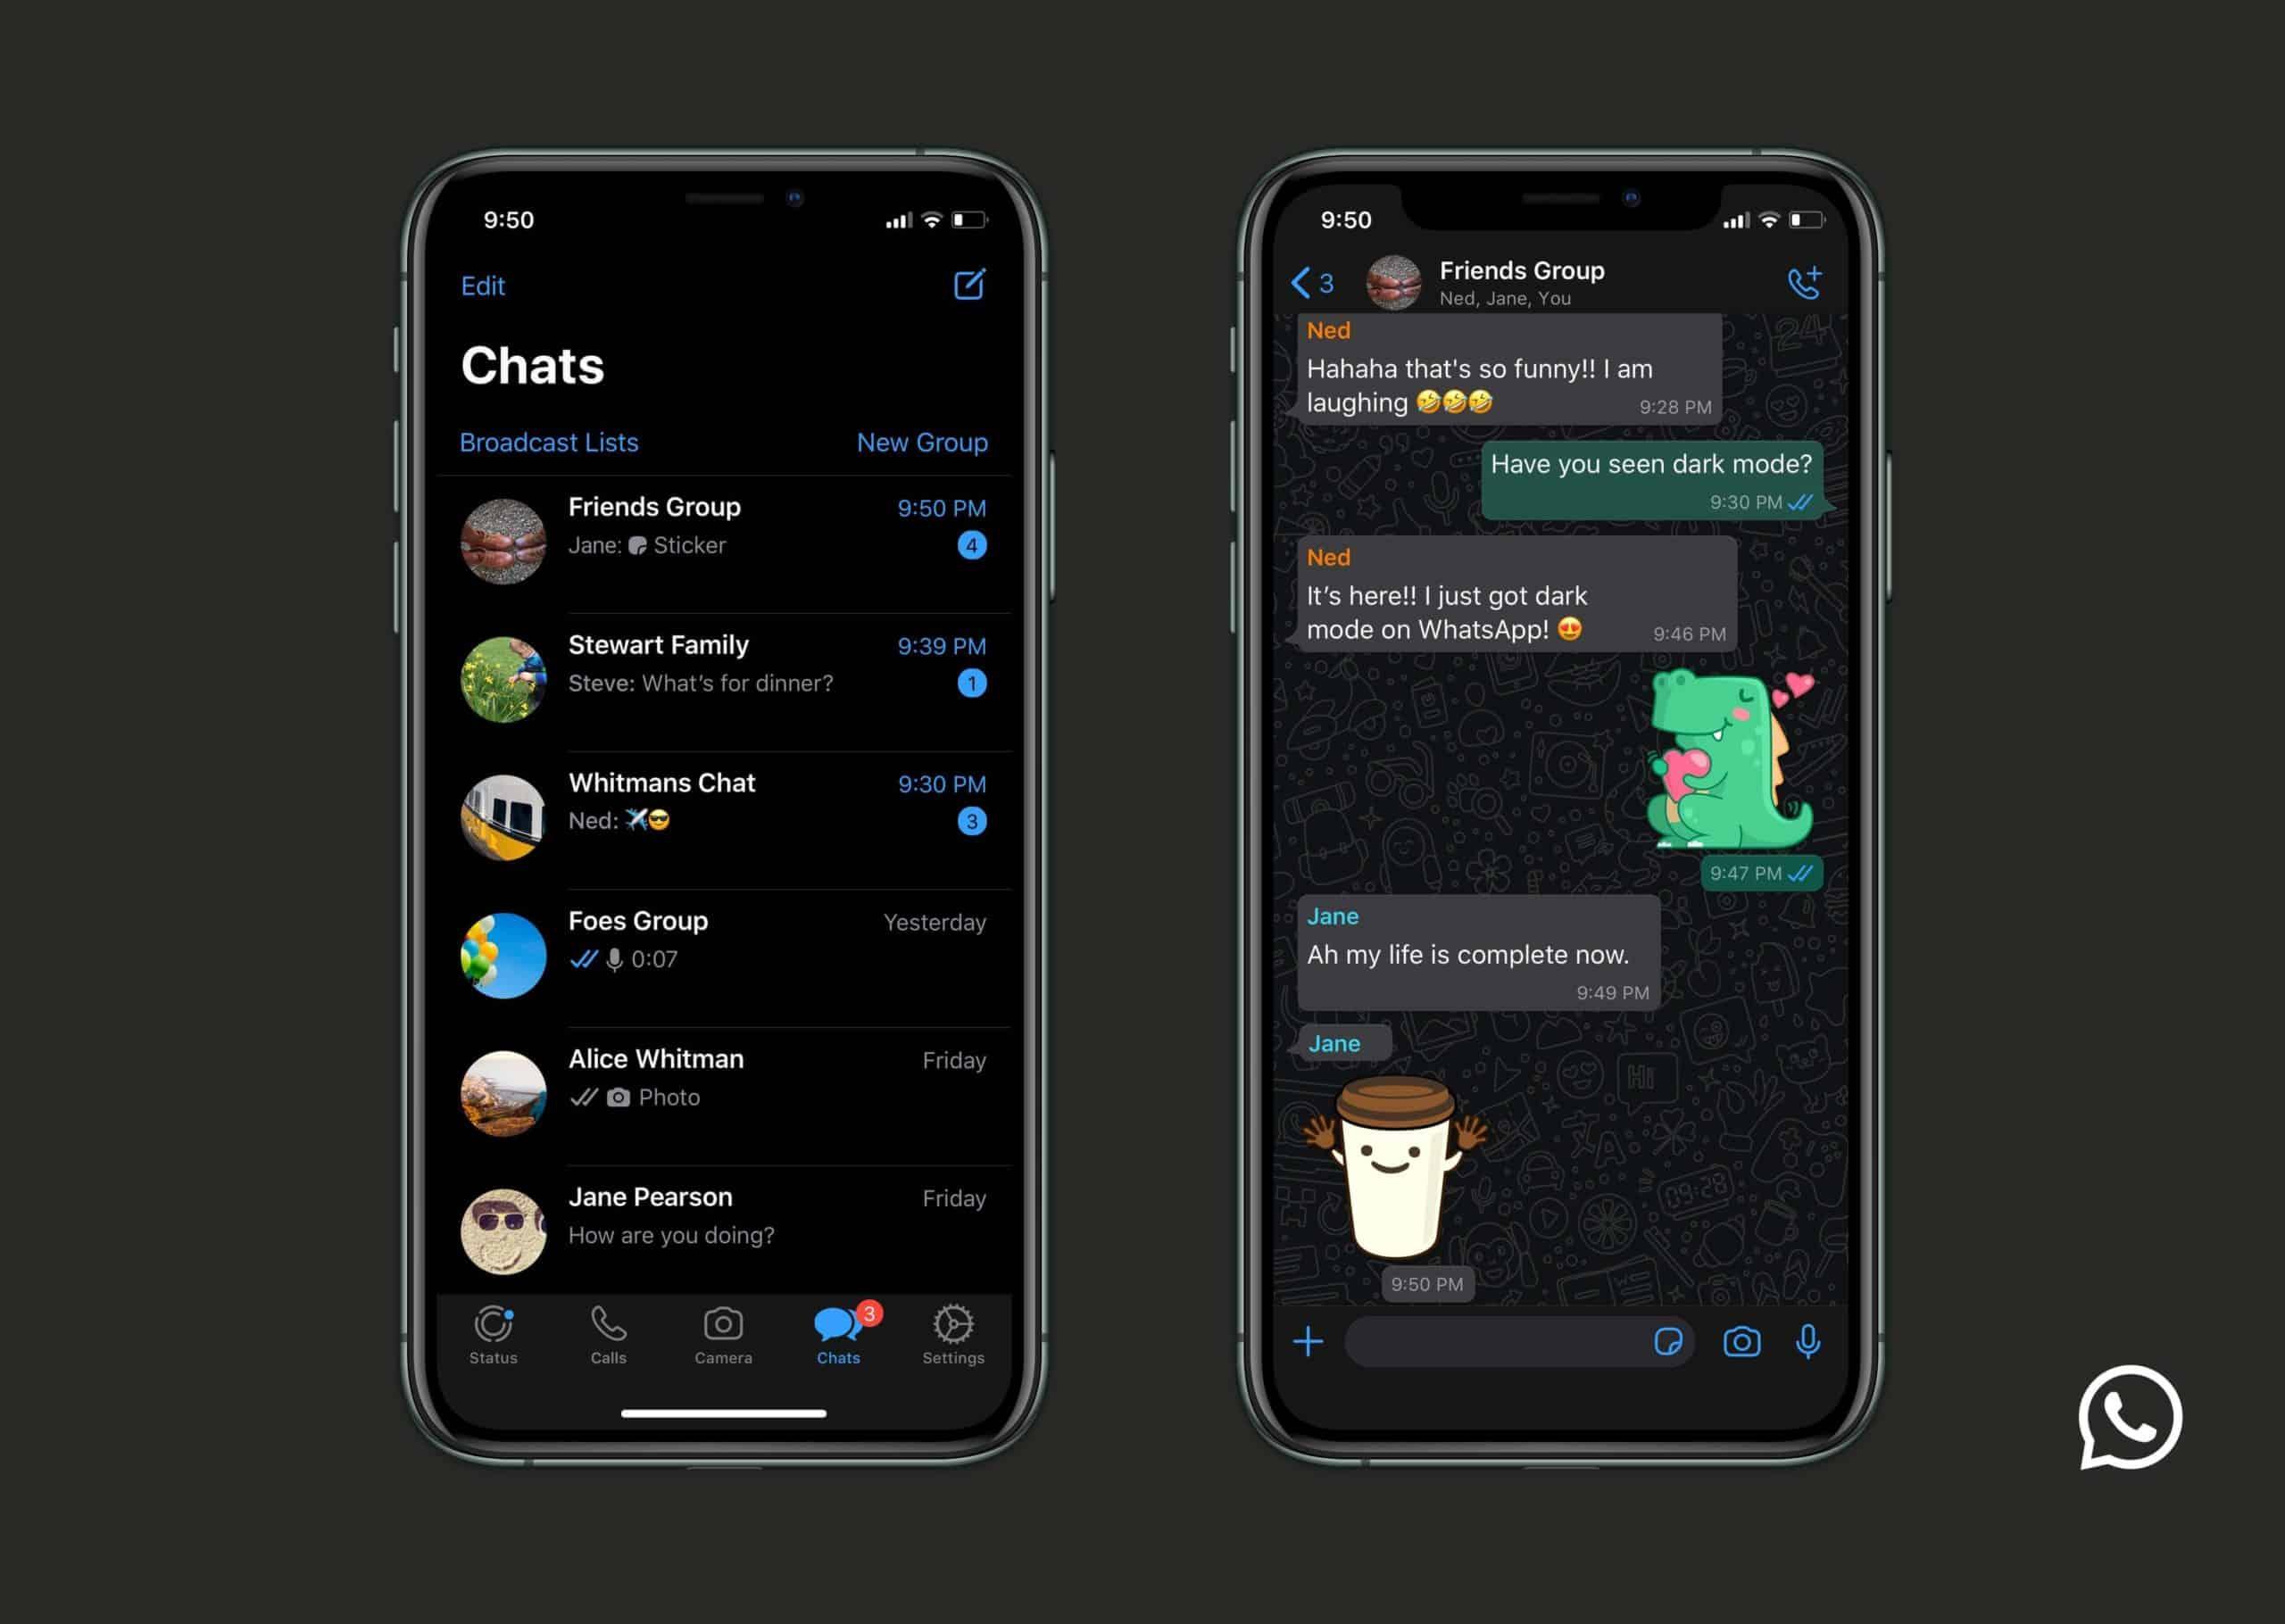 Apabila-sudah-kembali-ke-menu-utama-dan-cobalah-untuk-membuka-aplikasi-WhatsApp-di-iPhone-Anda.